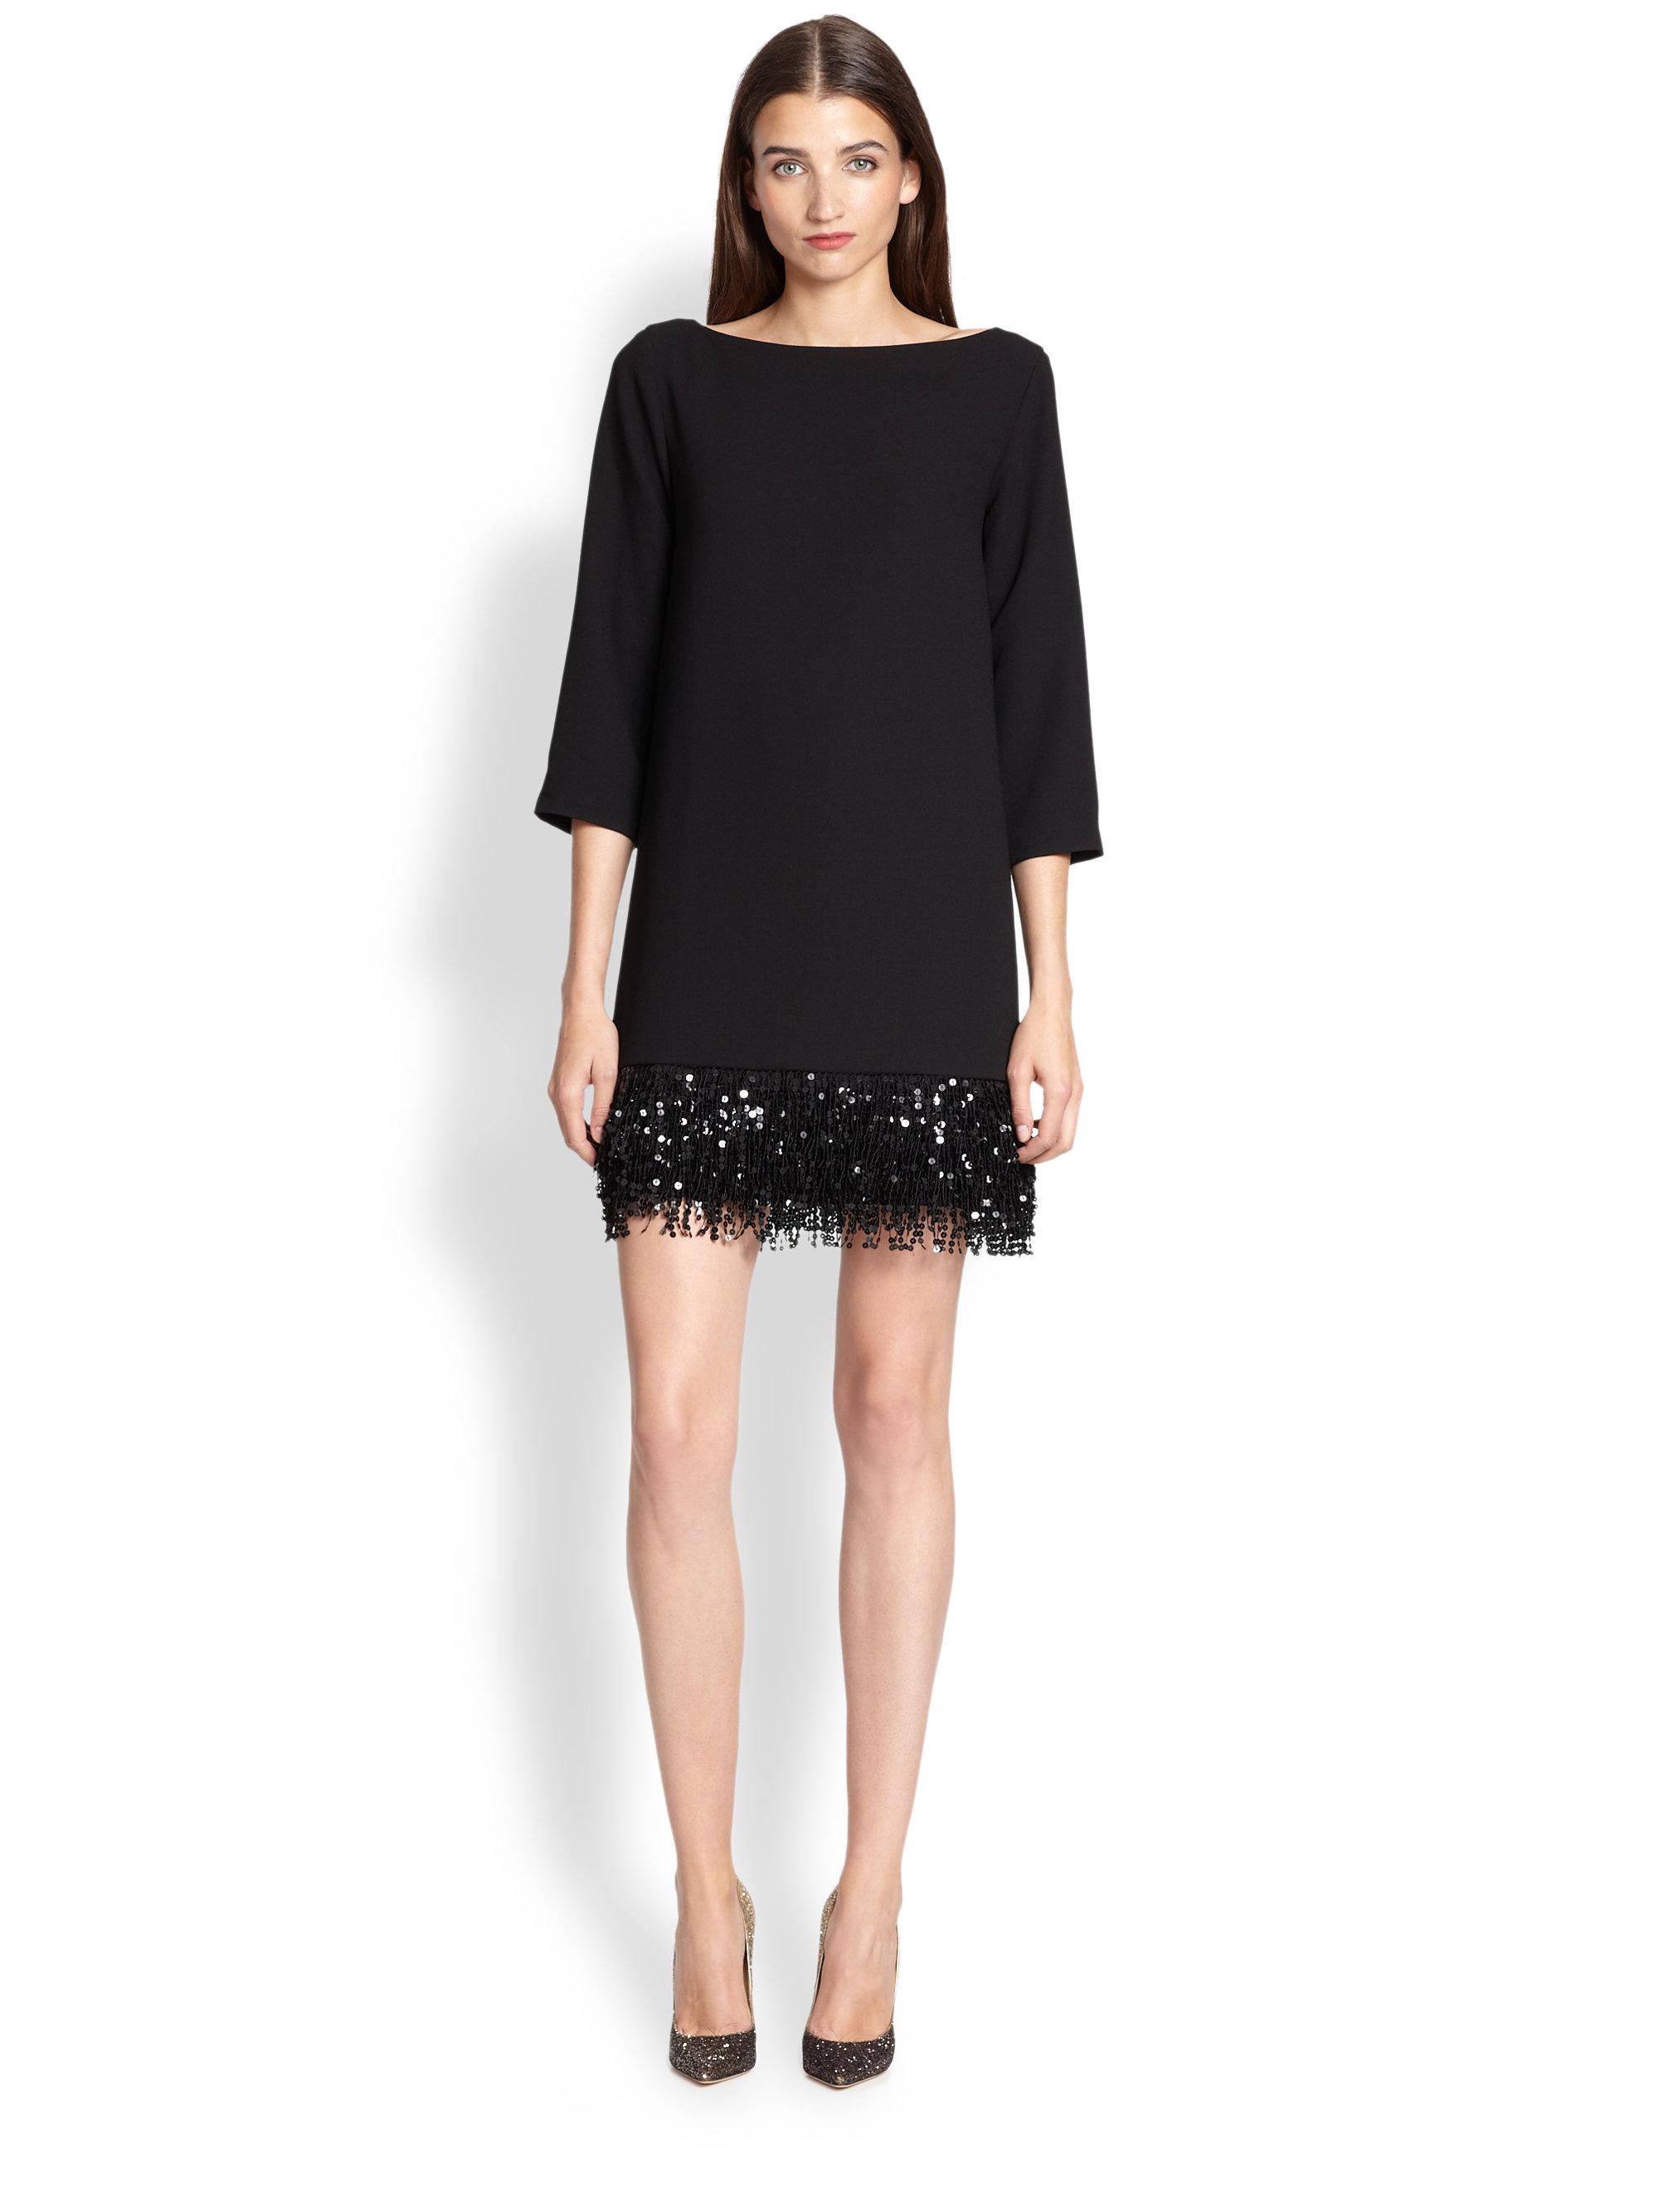 Kate Spade Sequin Dresses